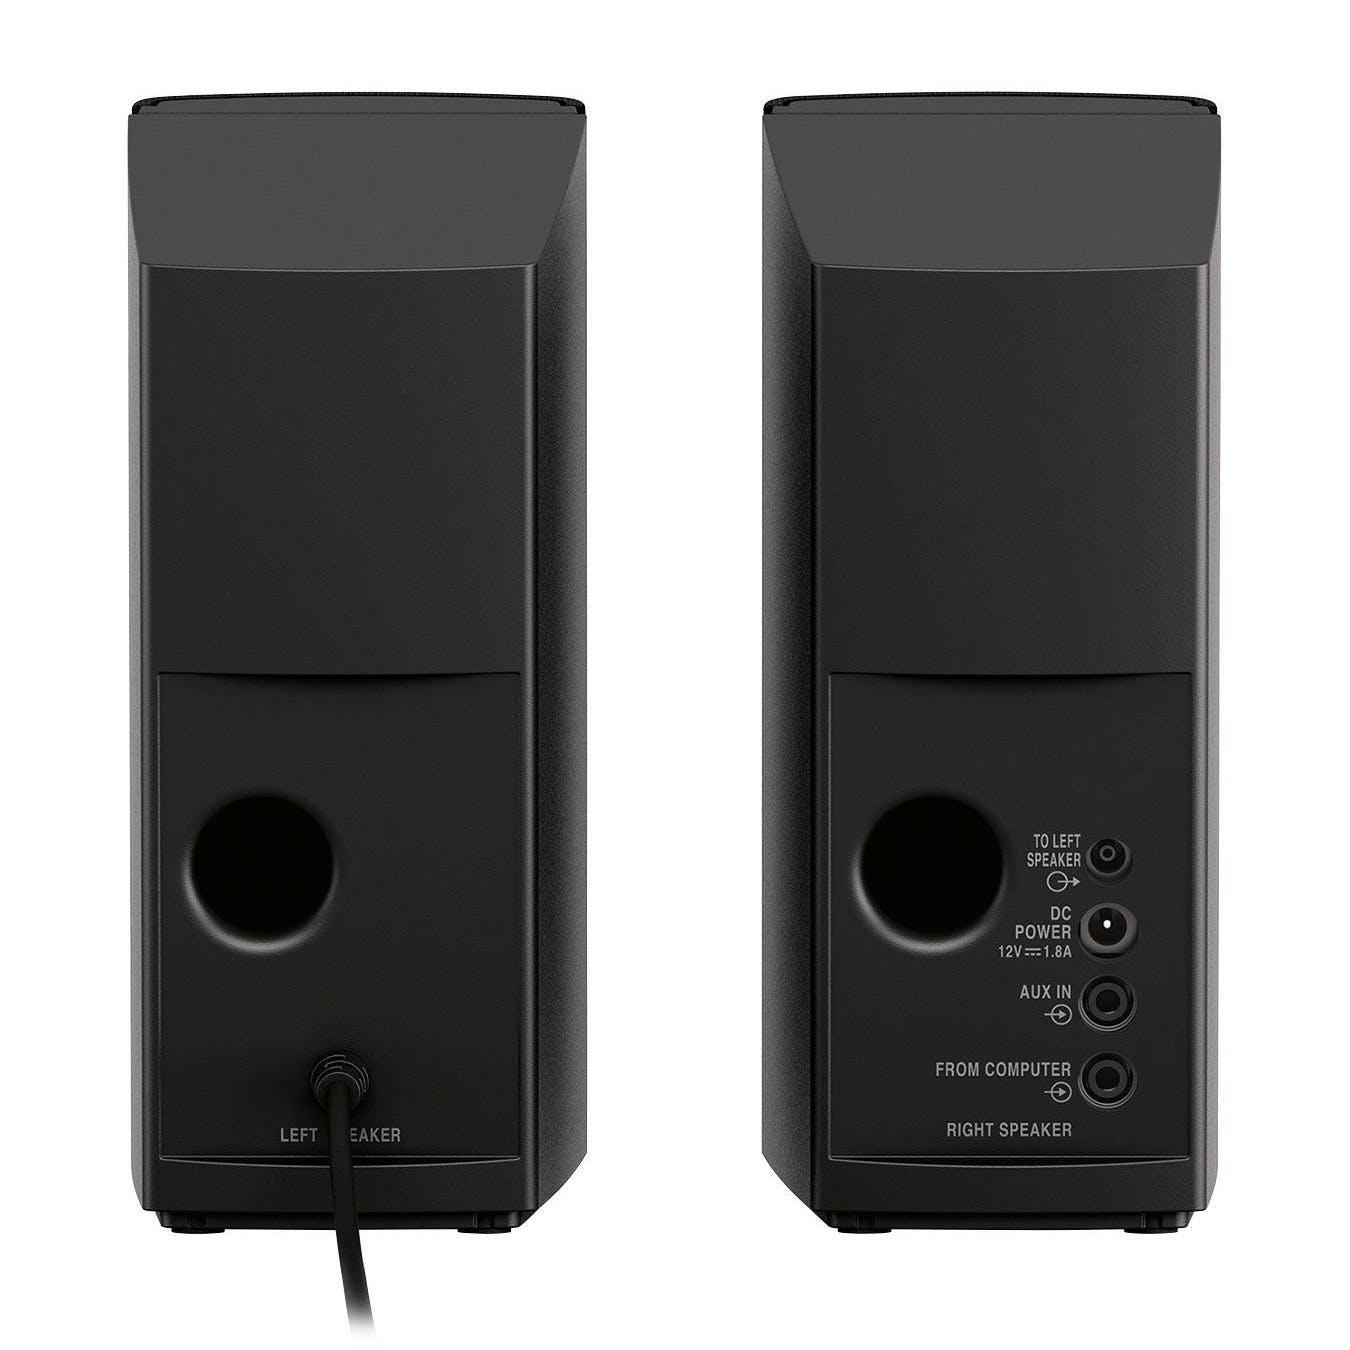 Companion Connecte: Bose COMPANION-2 Companion 2 Series III Multimedia Speaker